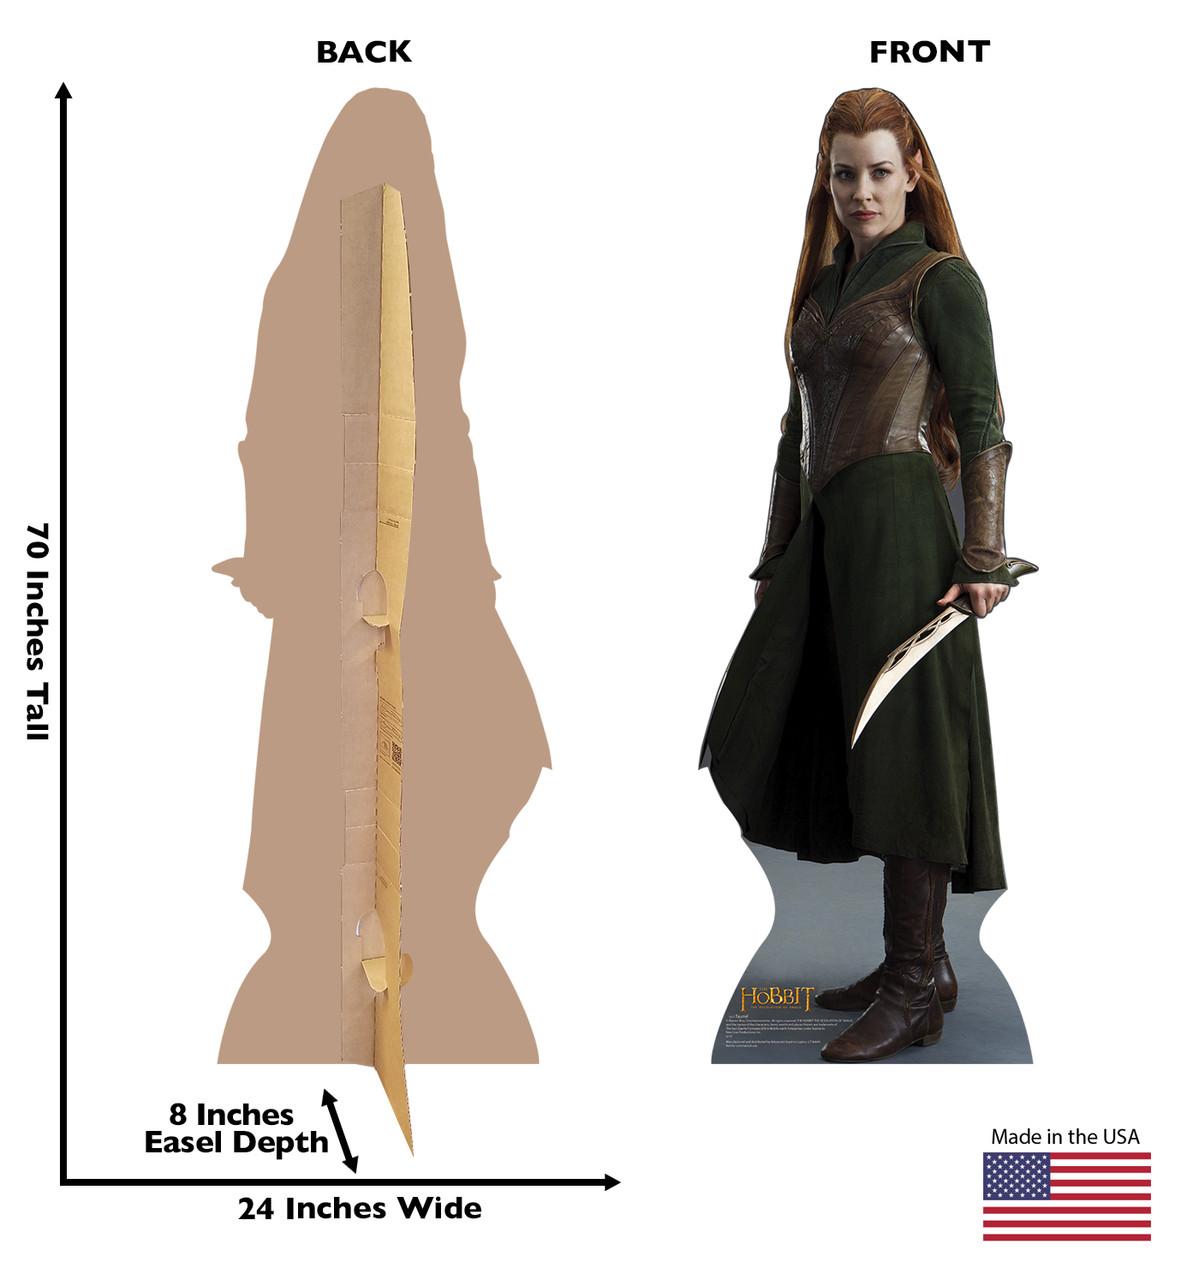 Life-size Tauriel Cardboard Standup | Cardboard Cutout